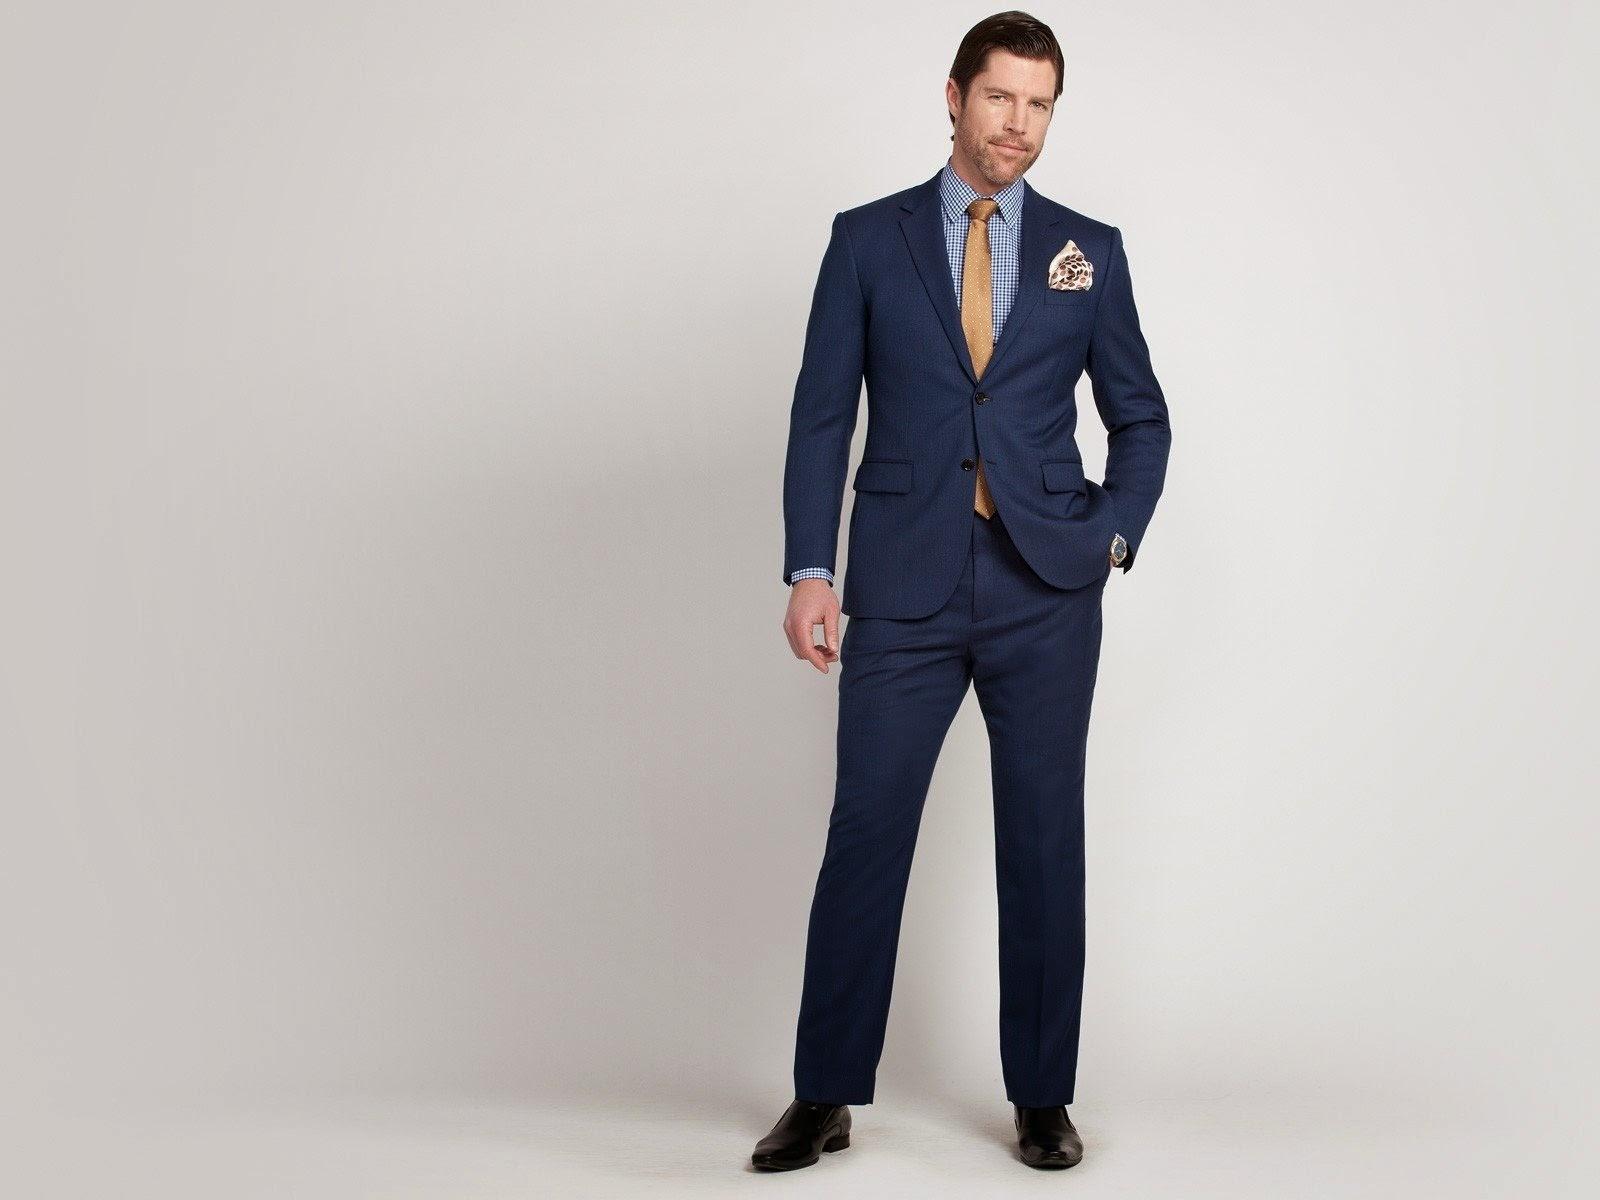 Deal Alert: Get $100 off of Indochino Premium Suits